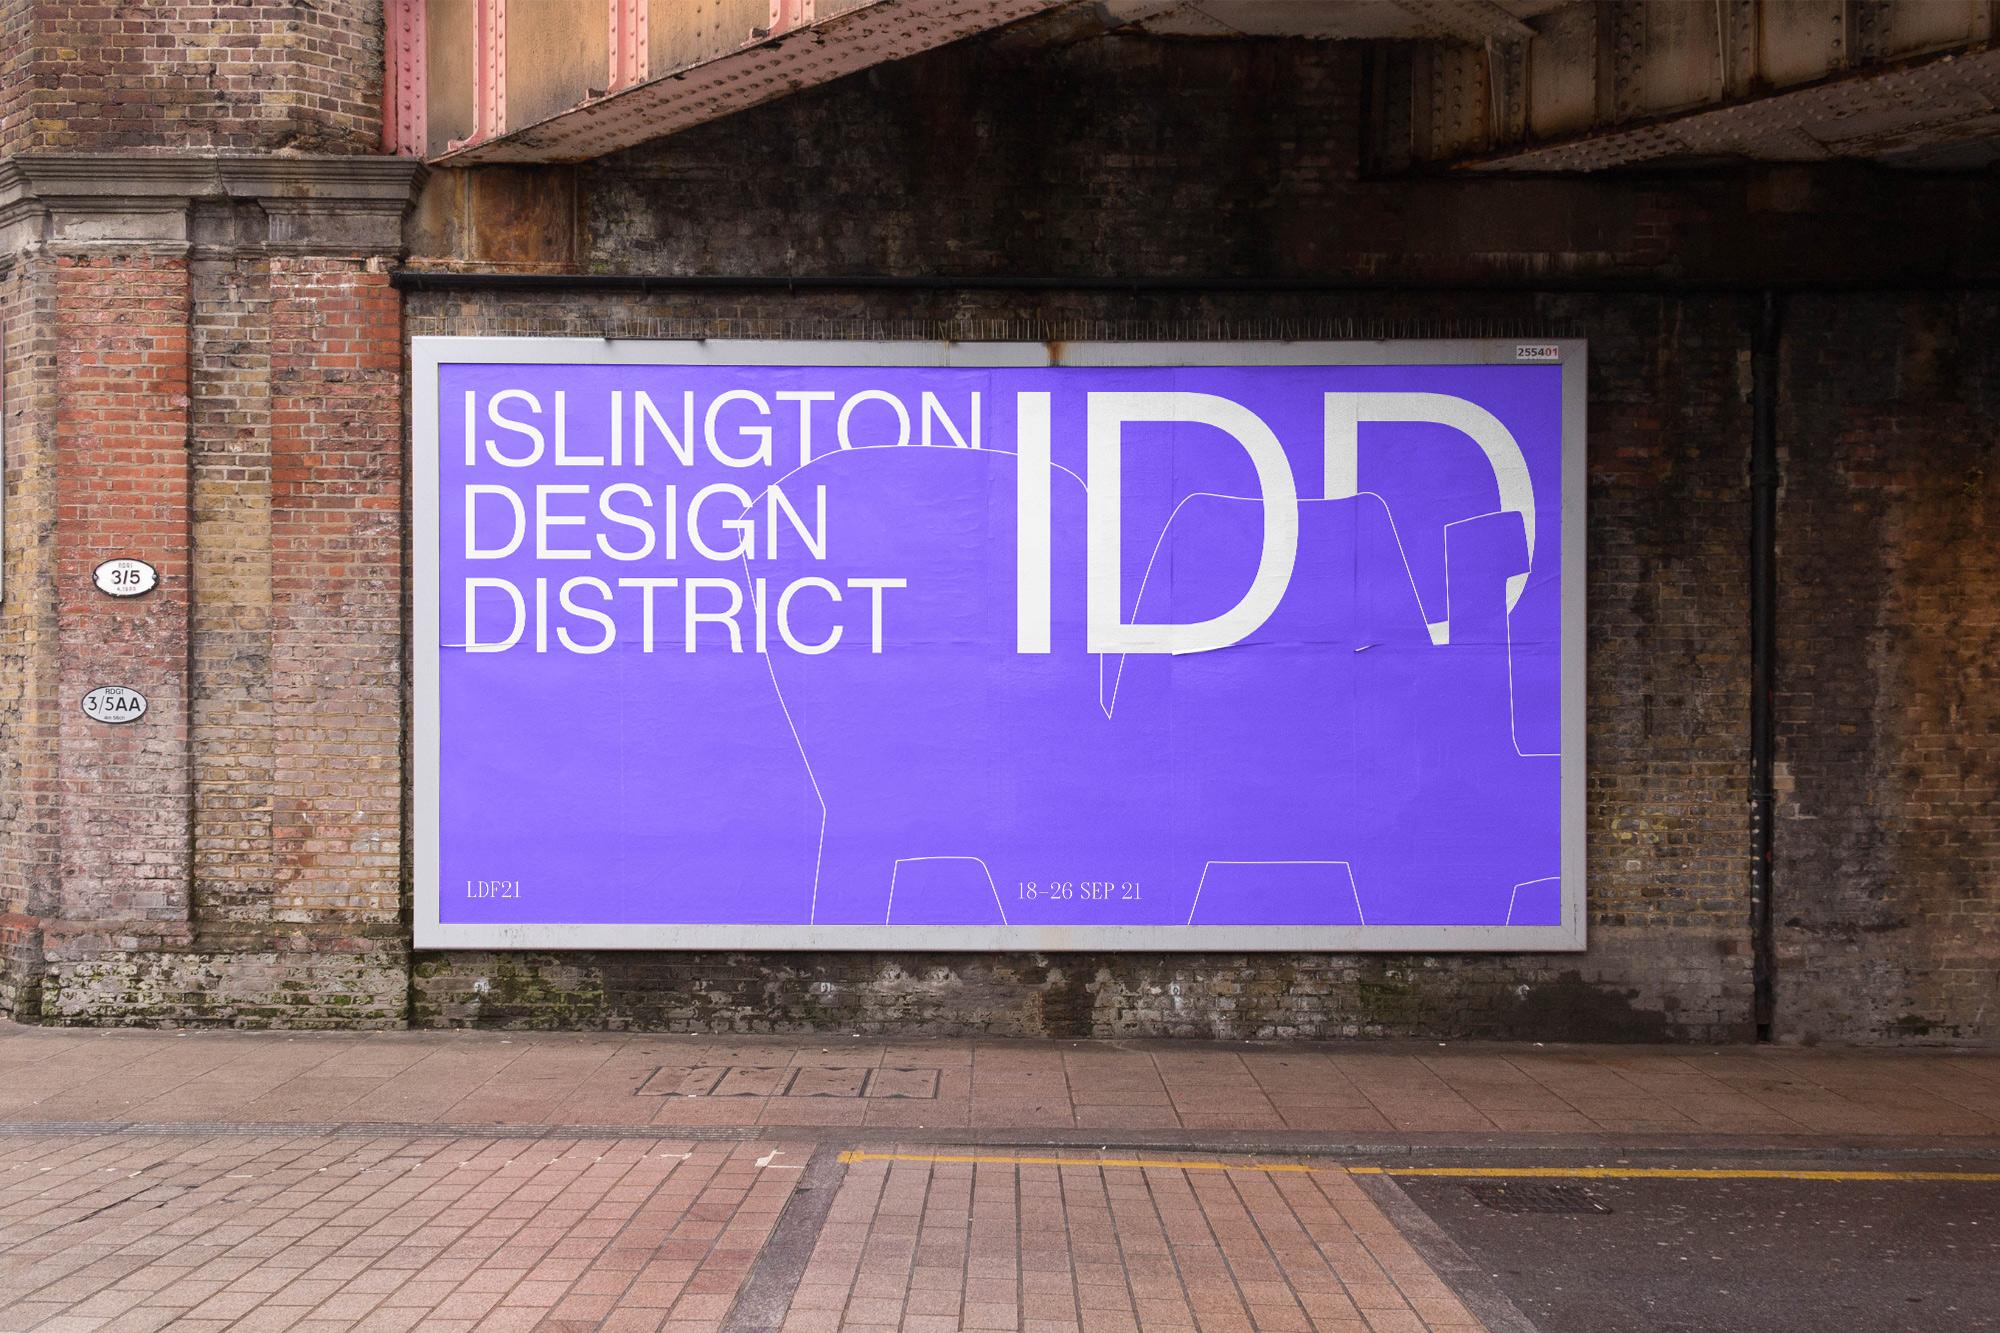 Campbell Hay × Islington Design District for London Design Festival 2021